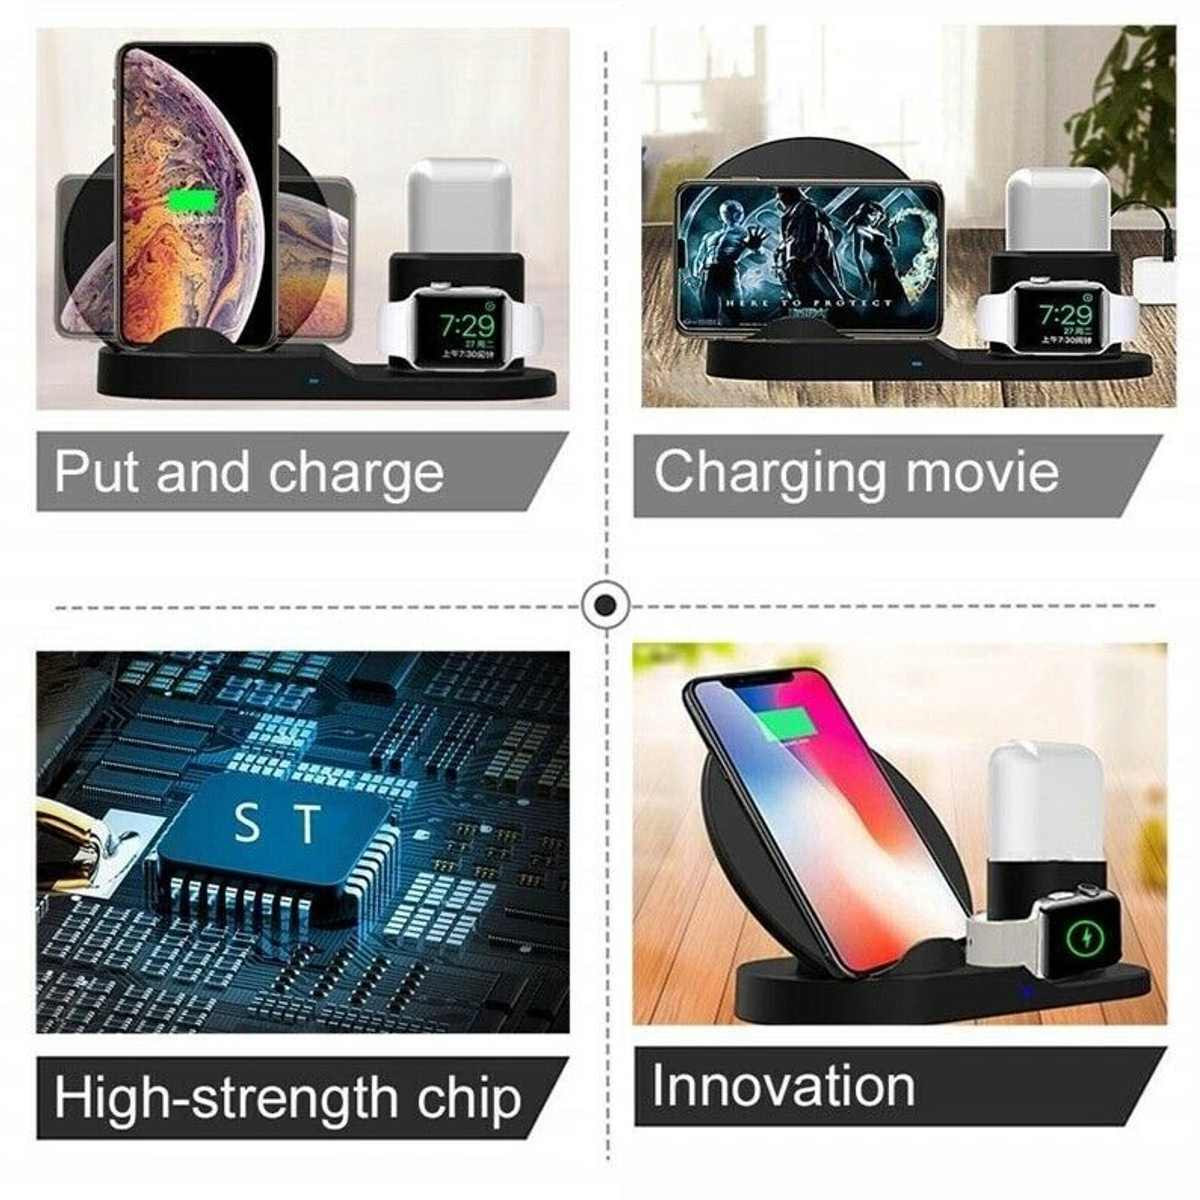 Cargador de inducción de carga inalámbrica Qi 3 en 1 para iPhone X XS Max para Airpod para Apple Watch estación de acoplamiento